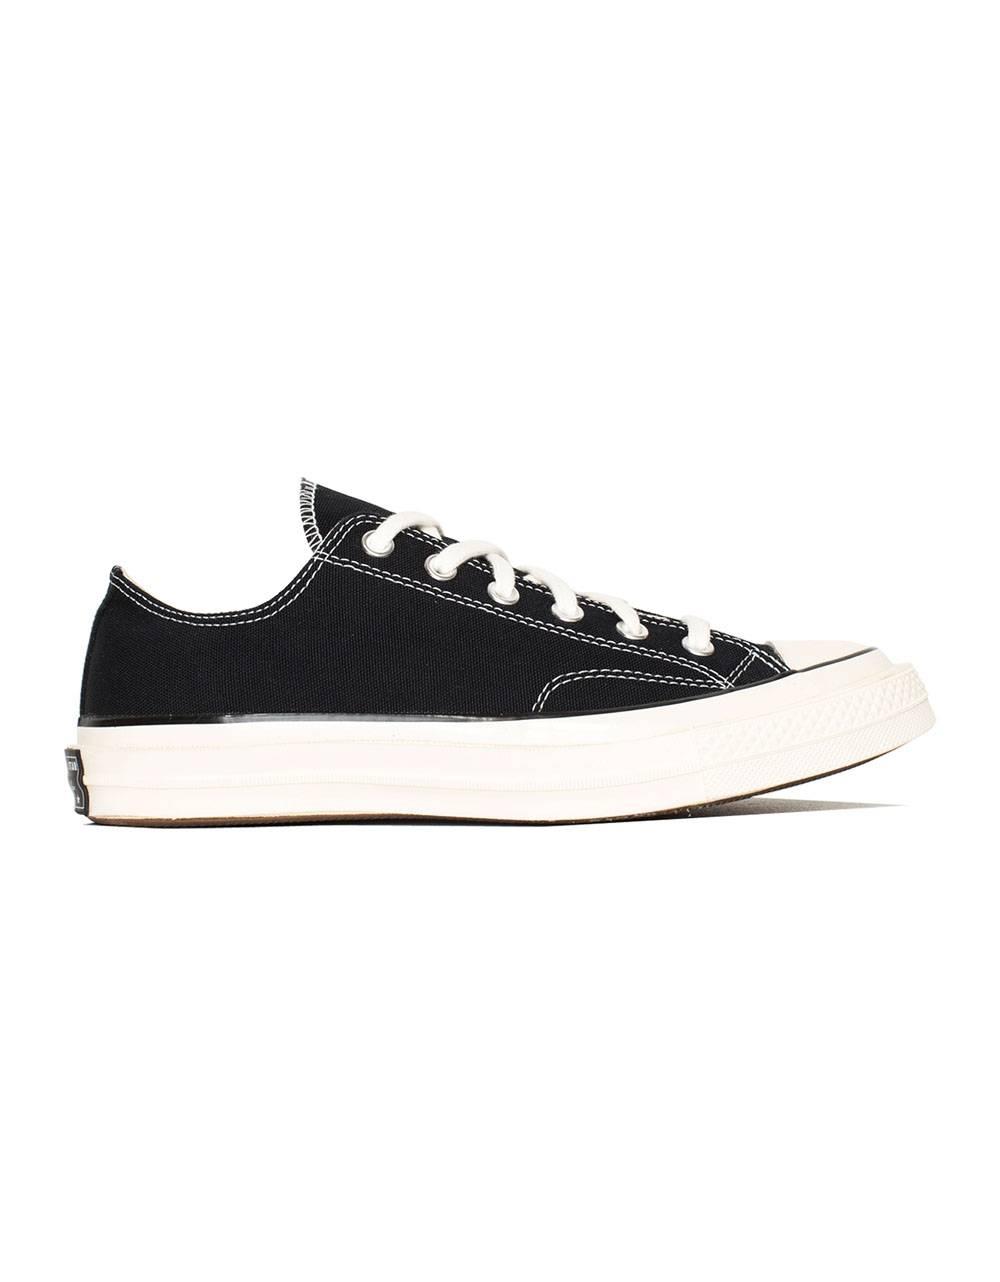 Converse Chuck 70 Double foxing ltd low - black Converse Sneakers 113,93€